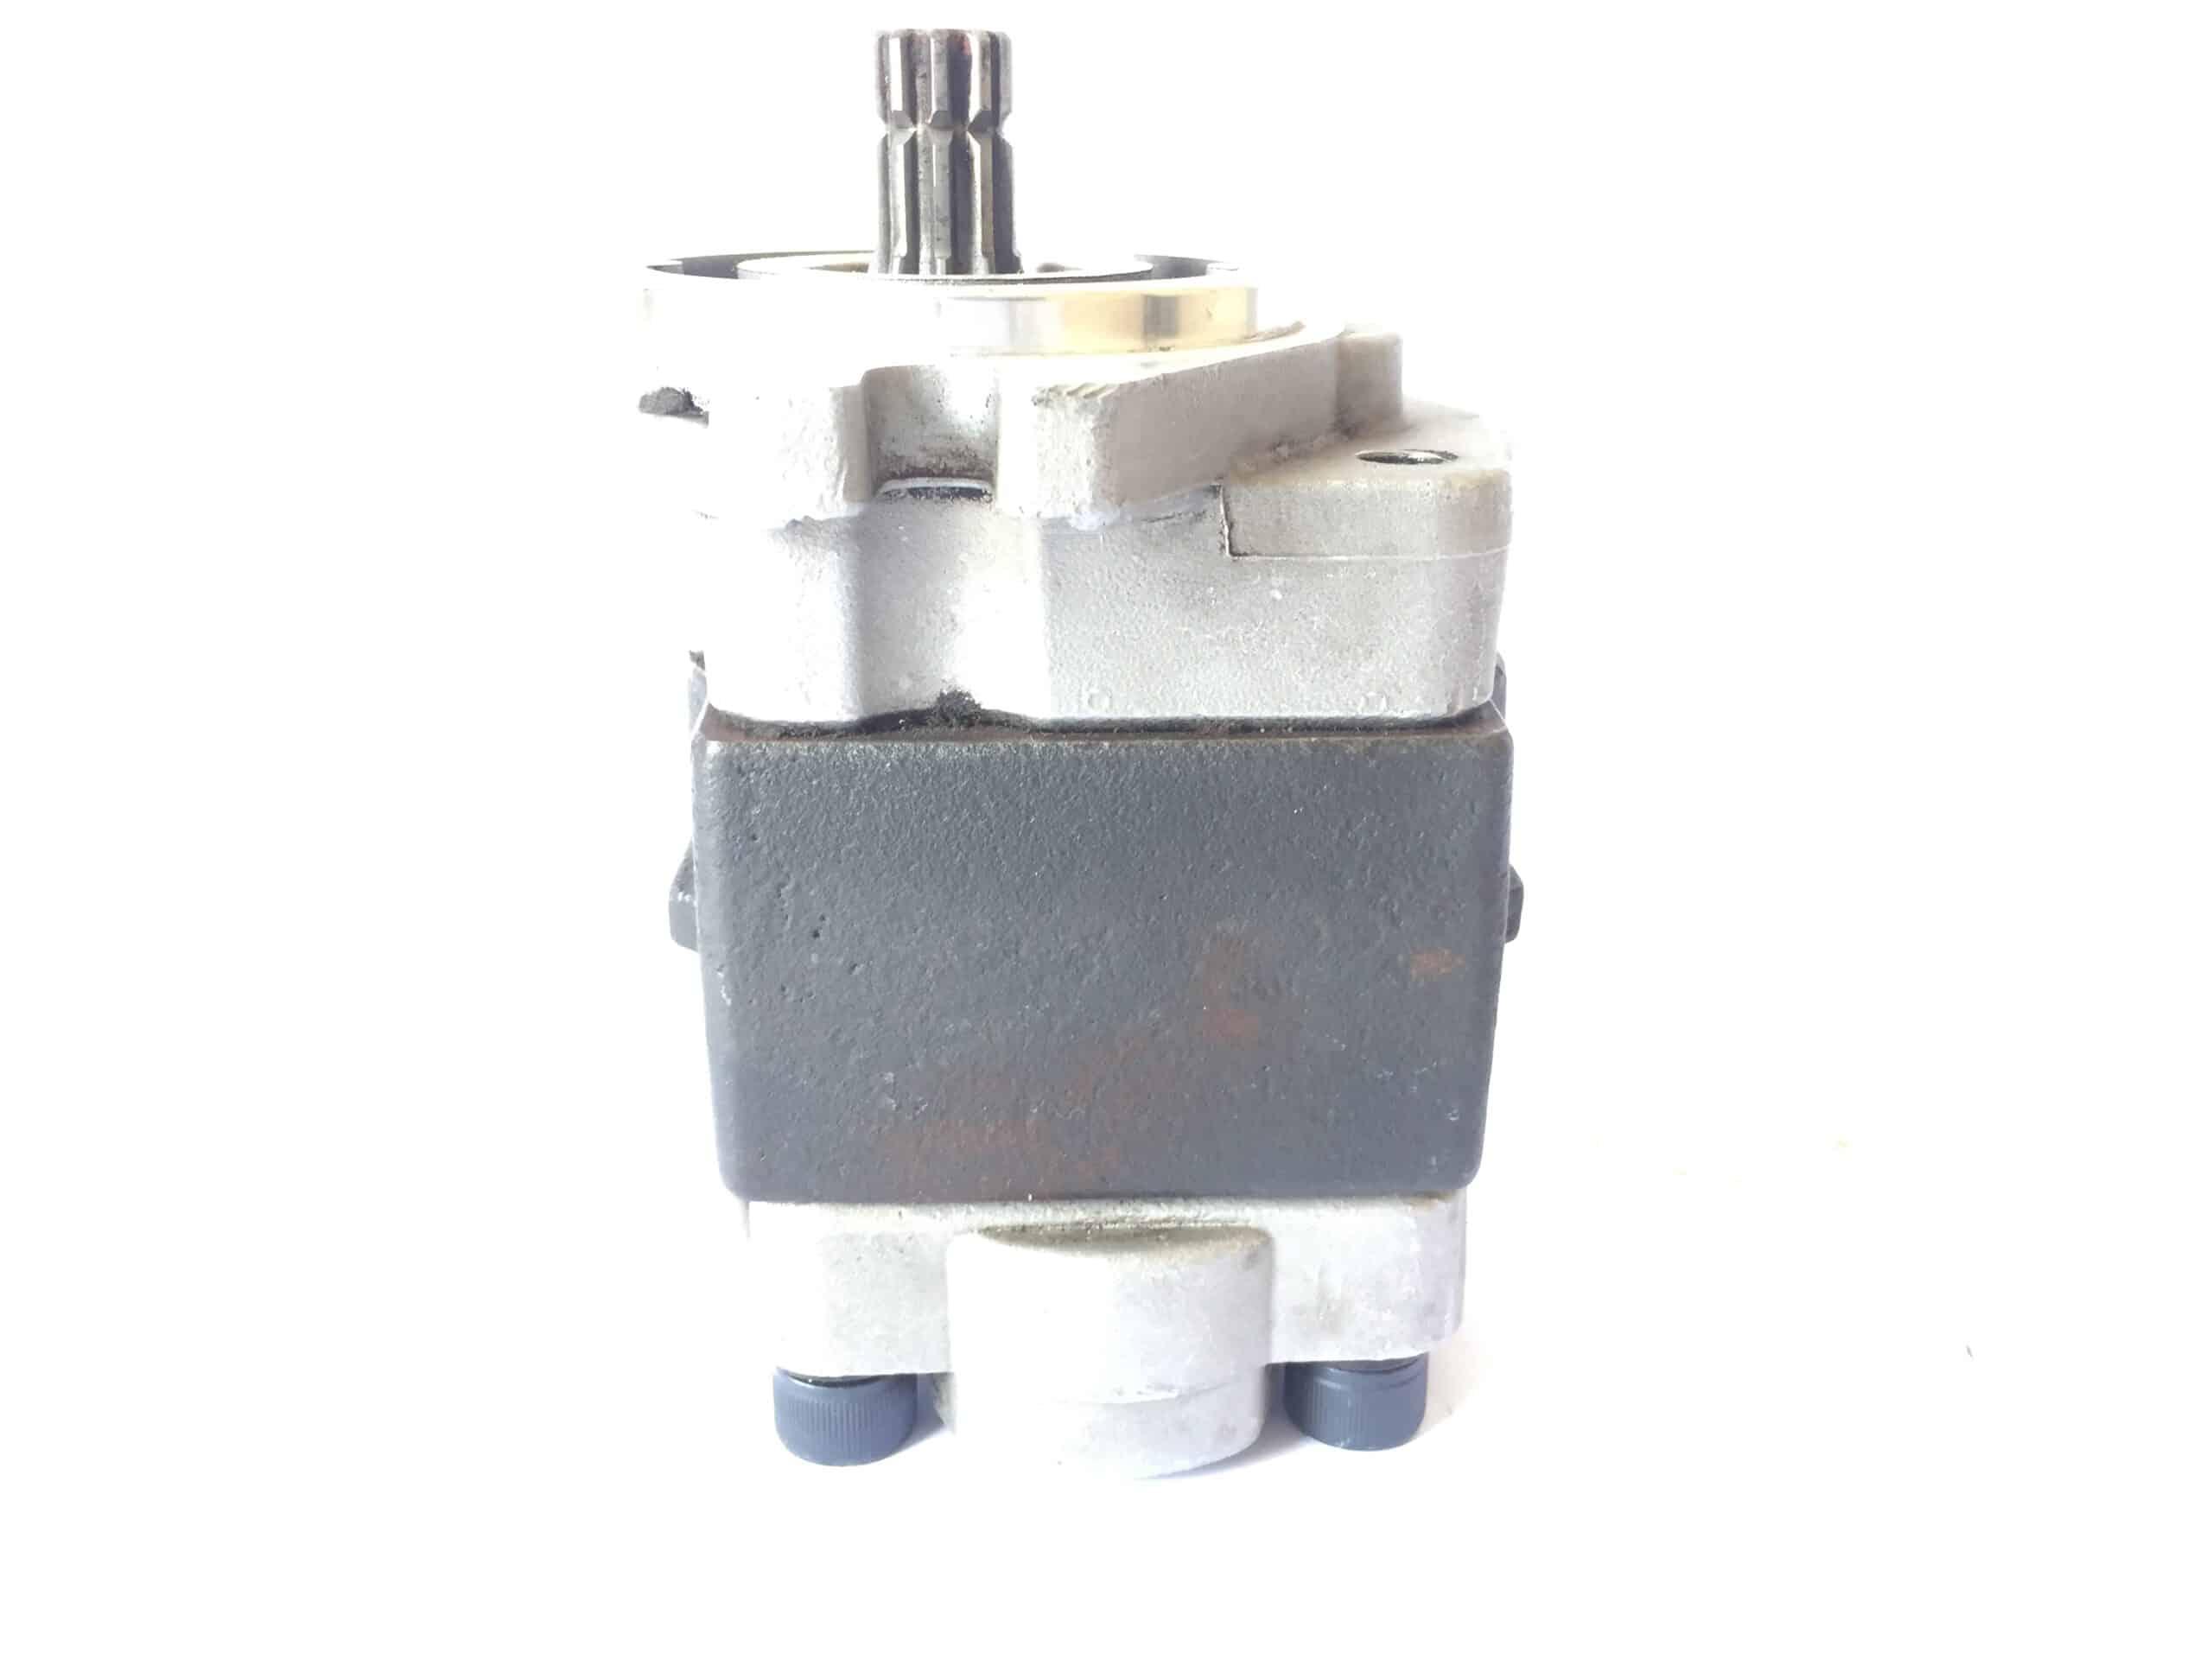 | Hydraulic Pump | Fazl-e-Rasheed and Company August 2021